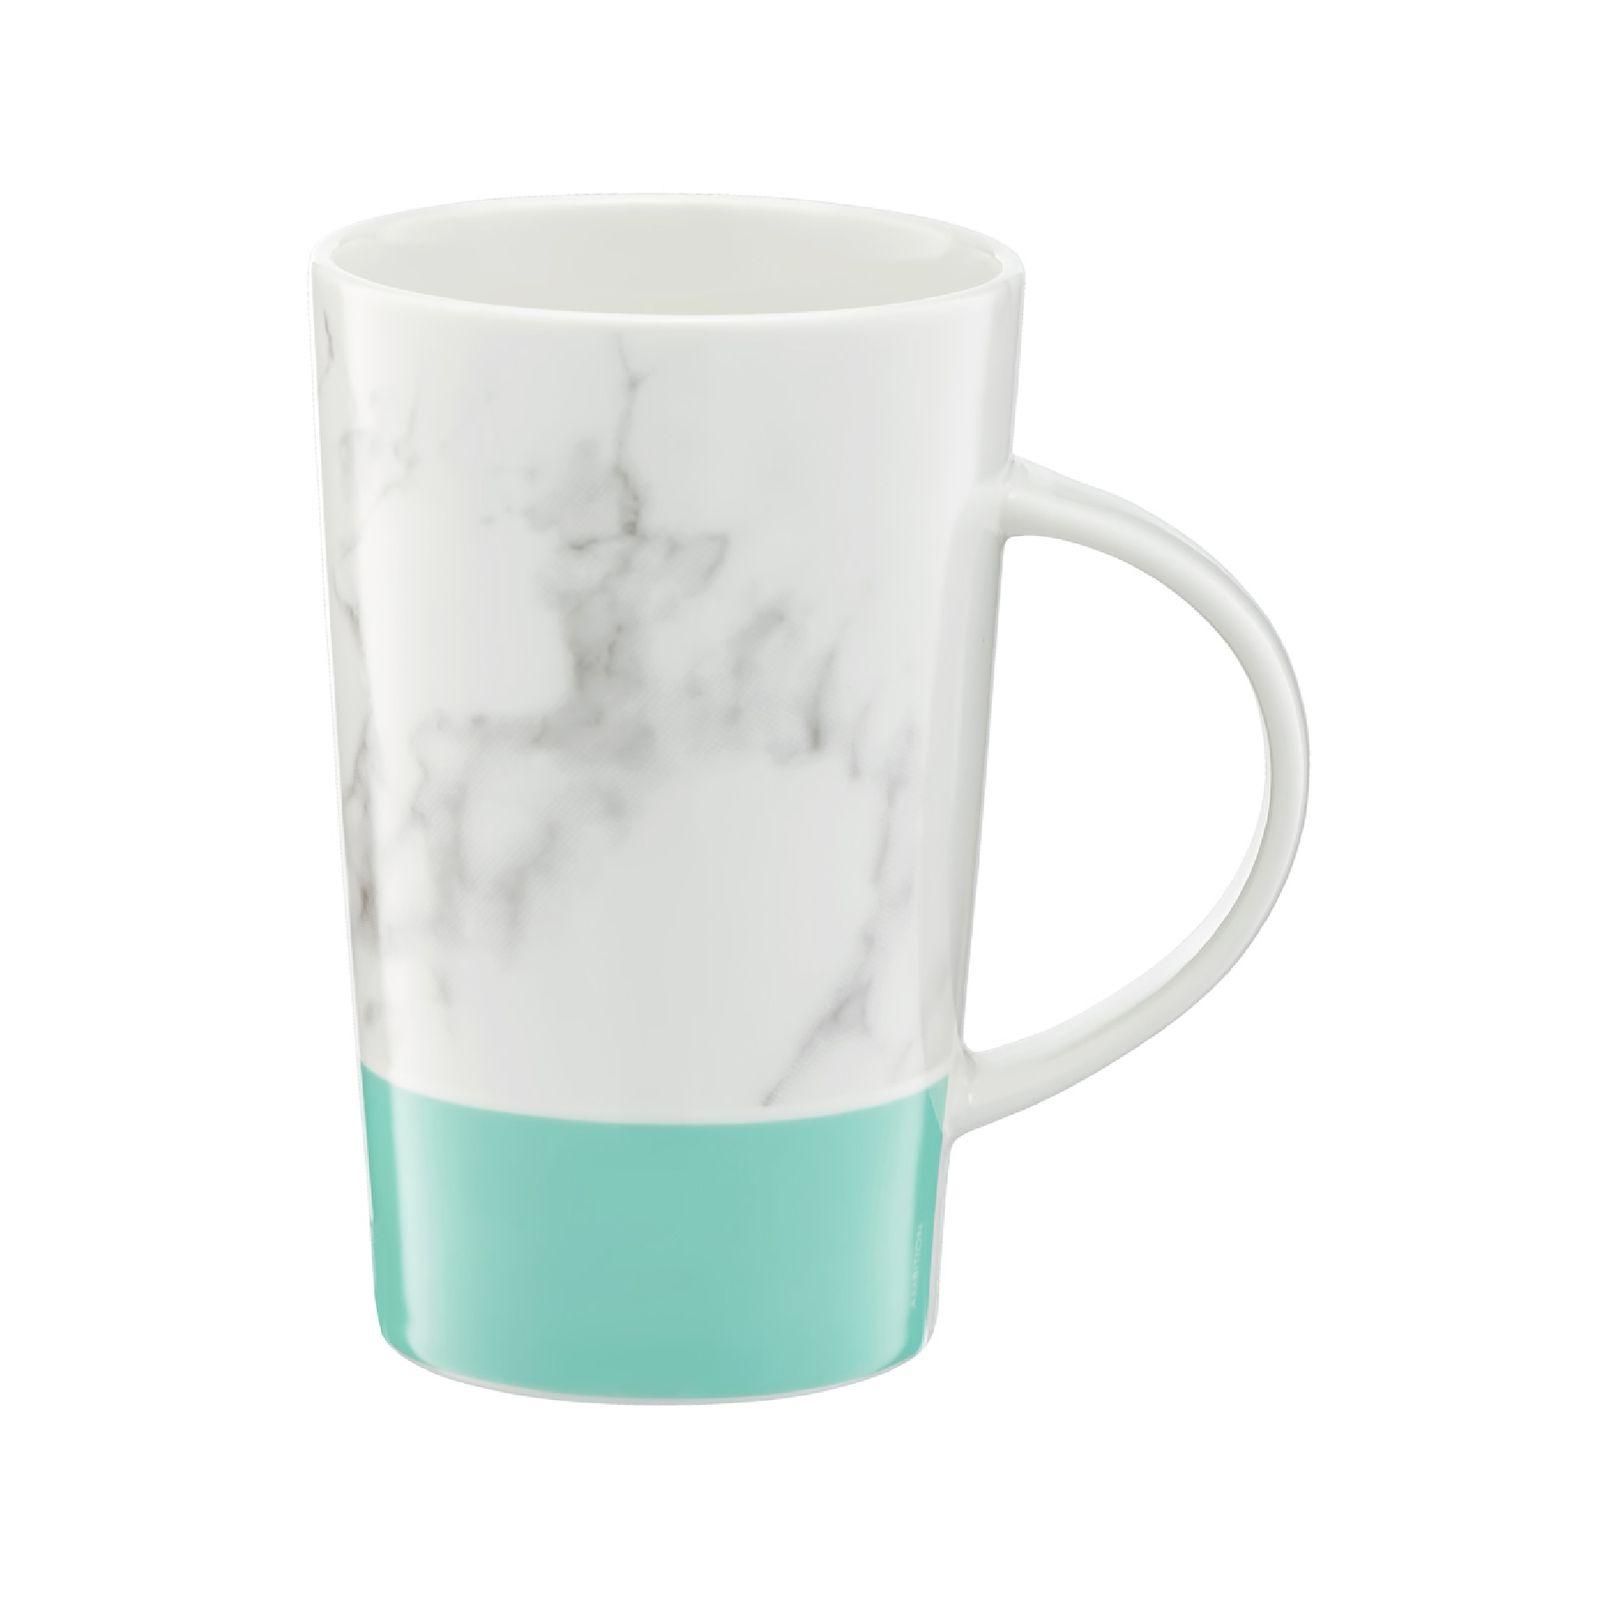 Kubek porcelanowy 430 ml Marble miętowy AMBITION